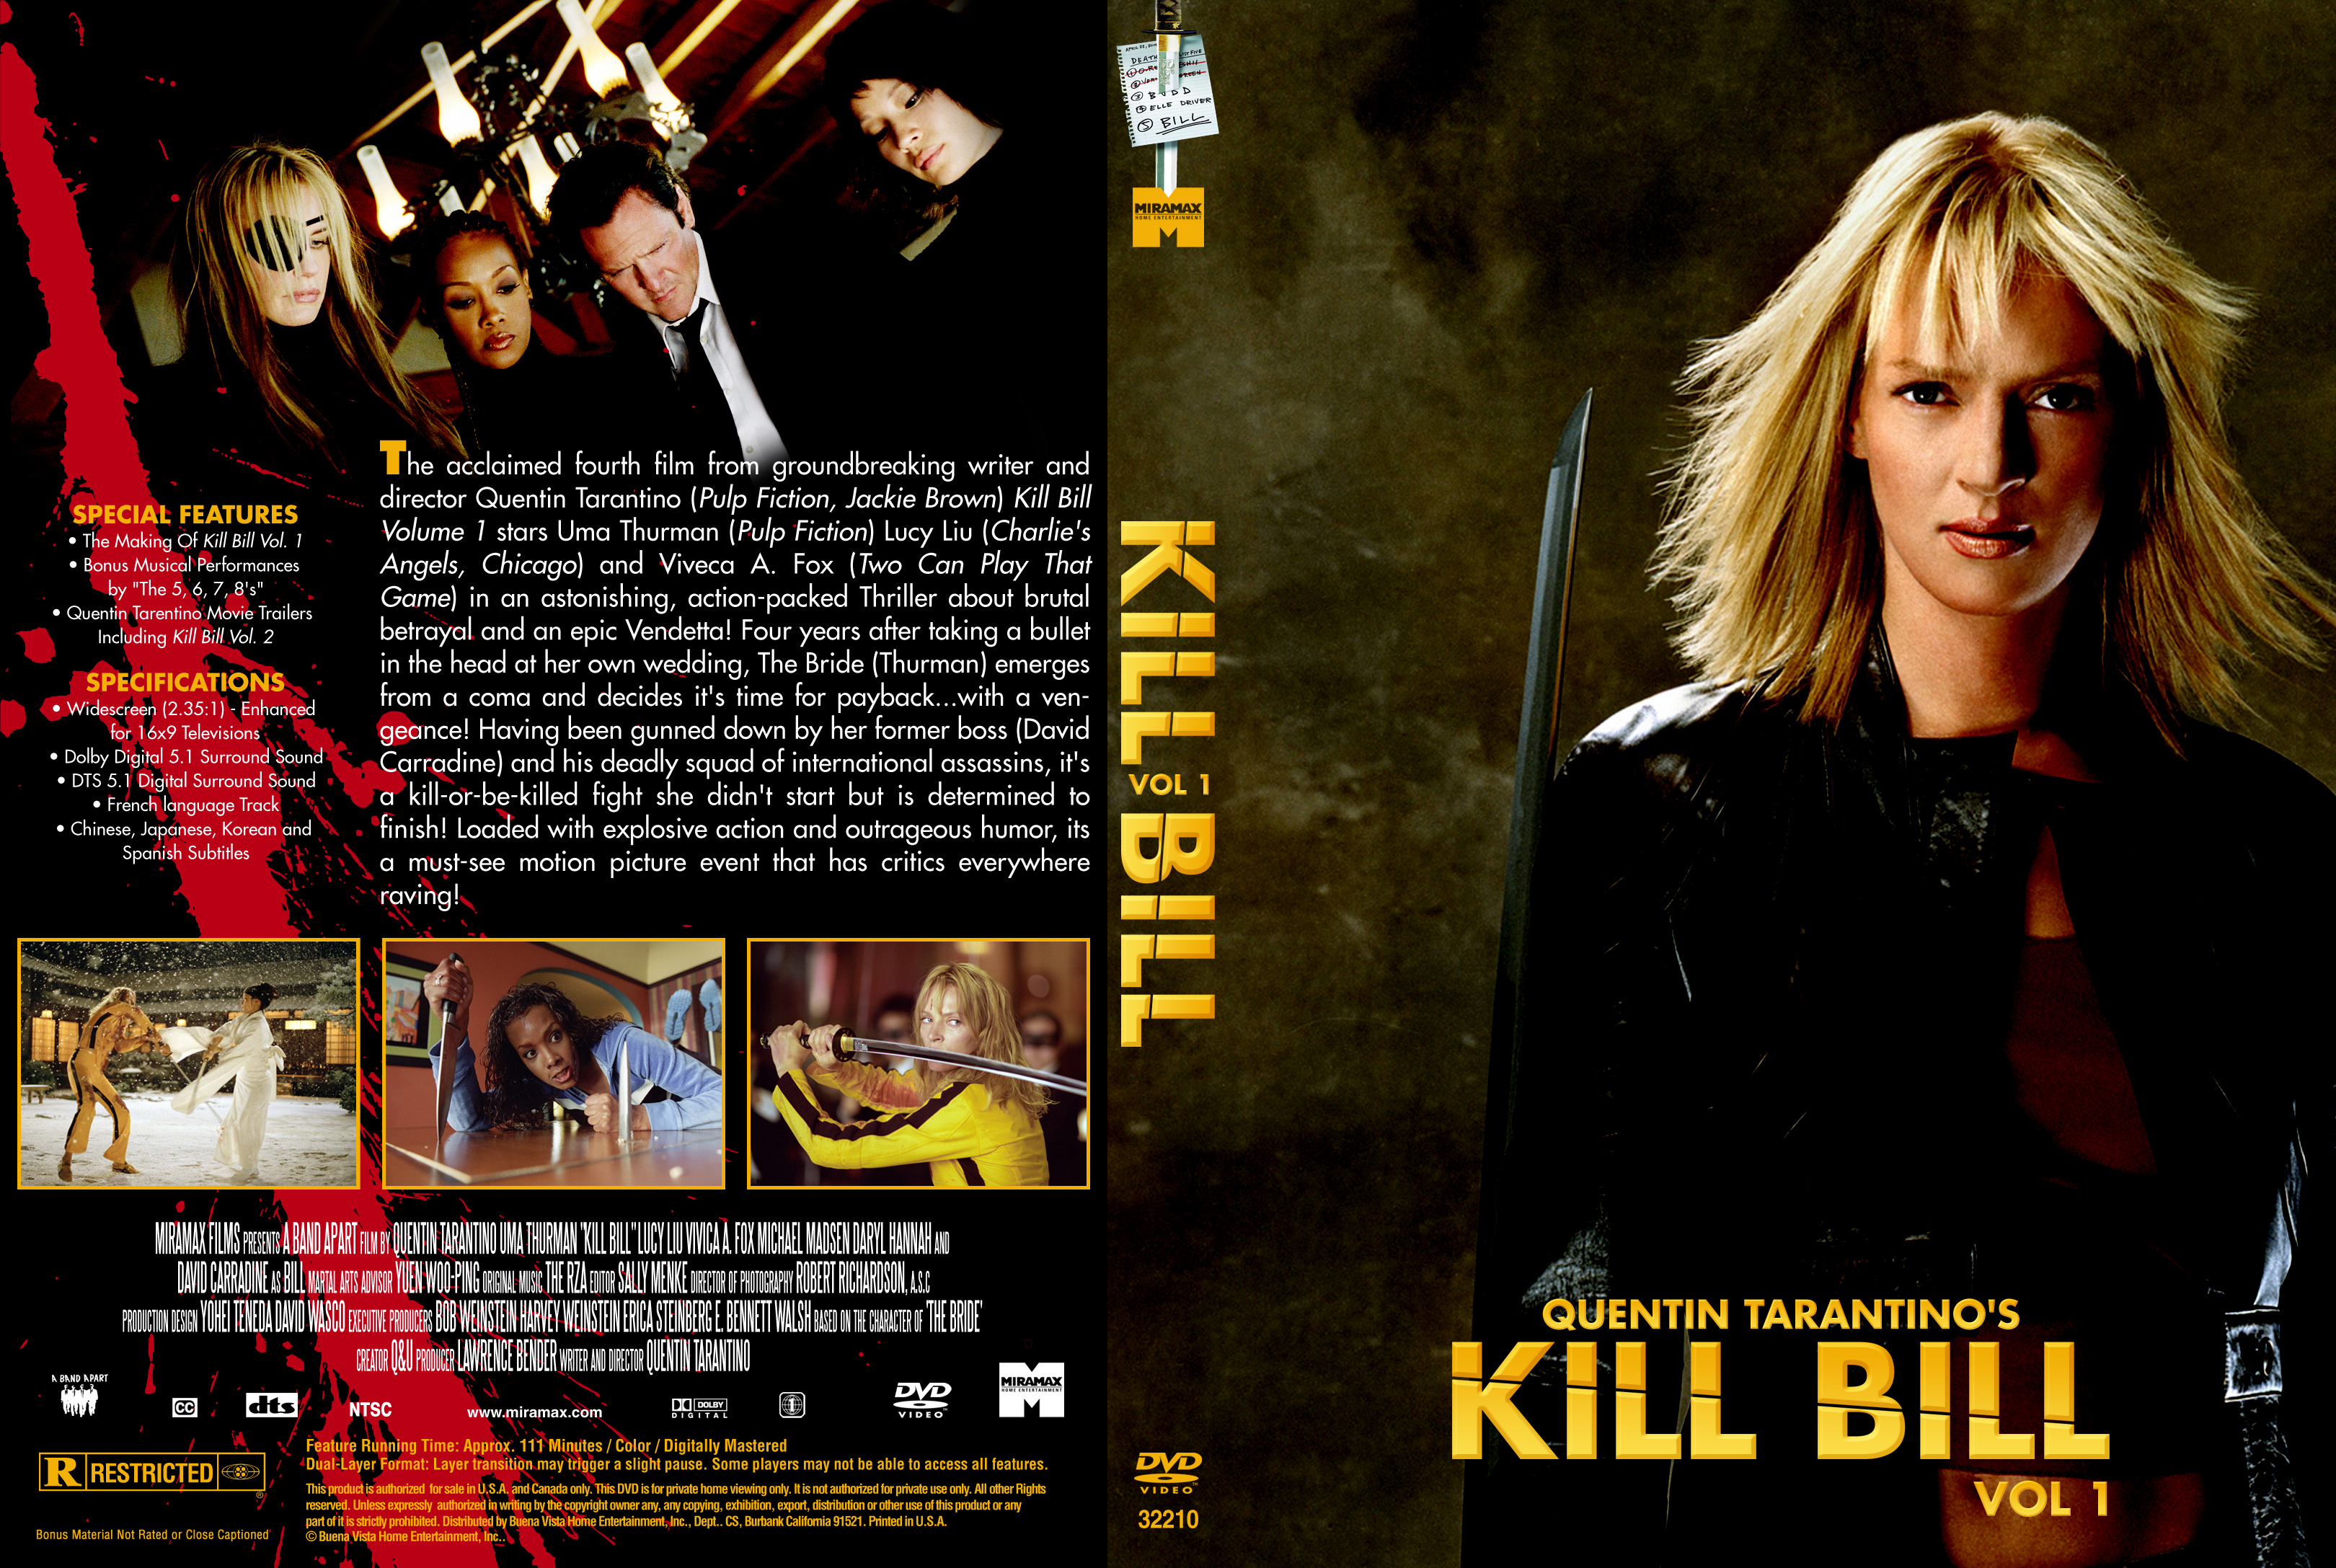 Covers Box Sk Kill Bill Vol 1 2003 High Quality Dvd Blueray Movie